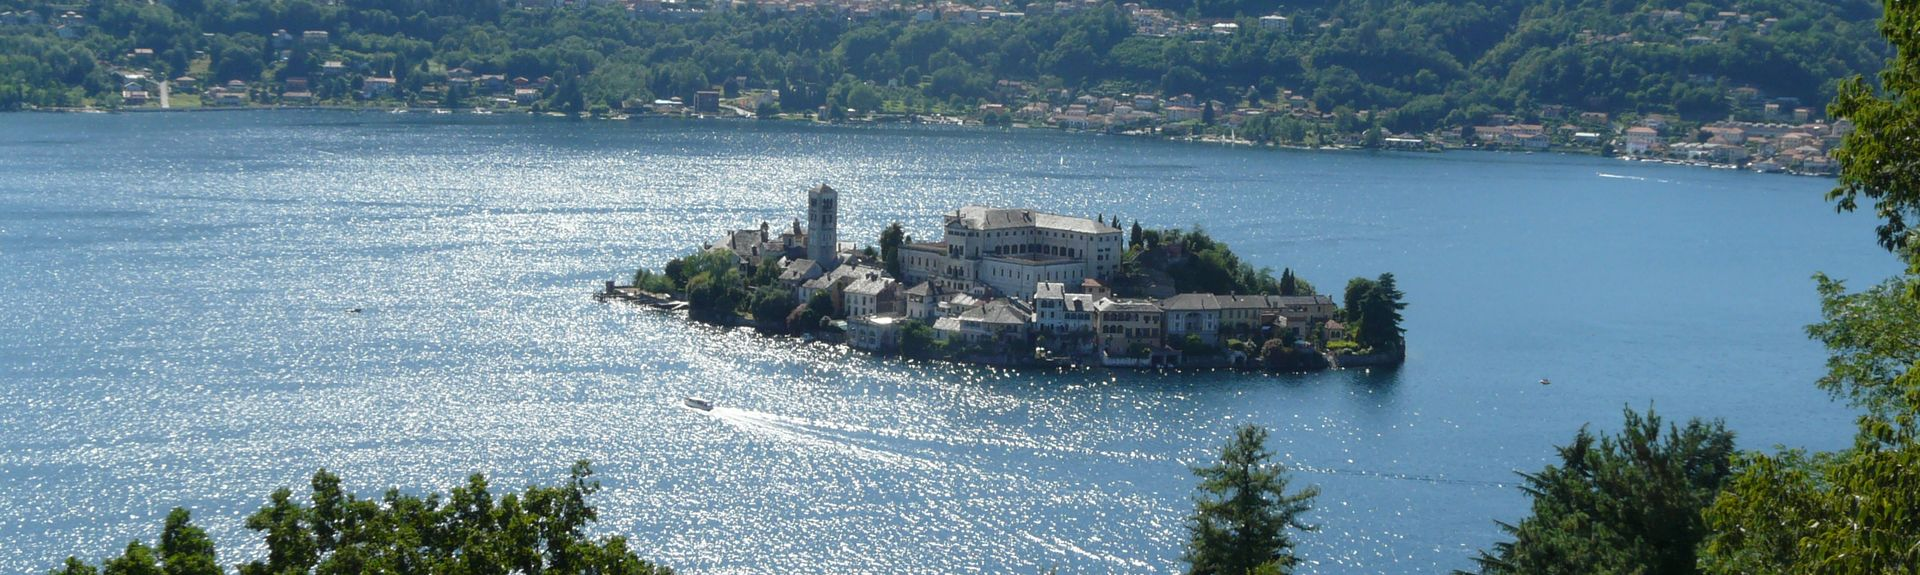 Gattinara, Vercelli, Piedmont, Italy